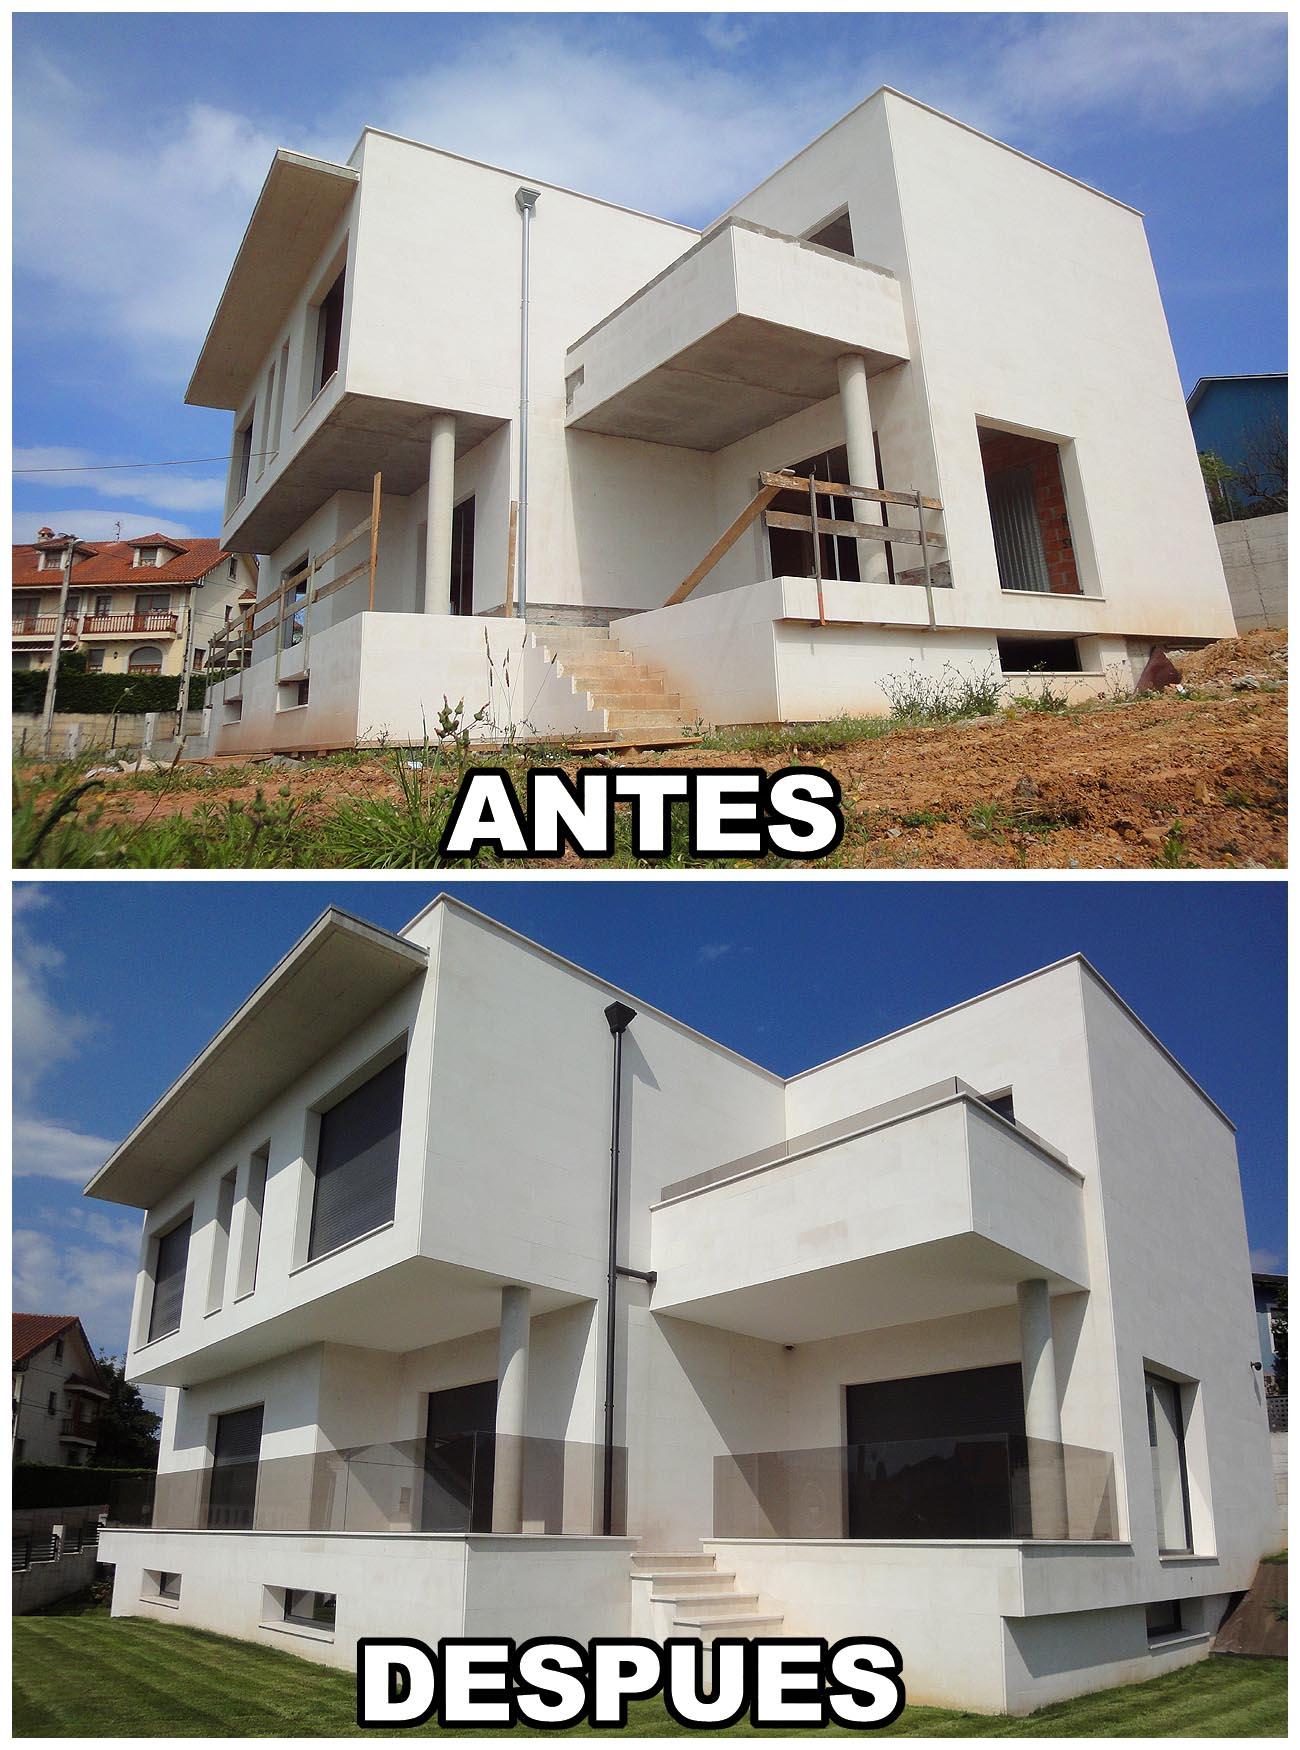 Construcciones de casas modernas dise os arquitect nicos for Construcciones modernas